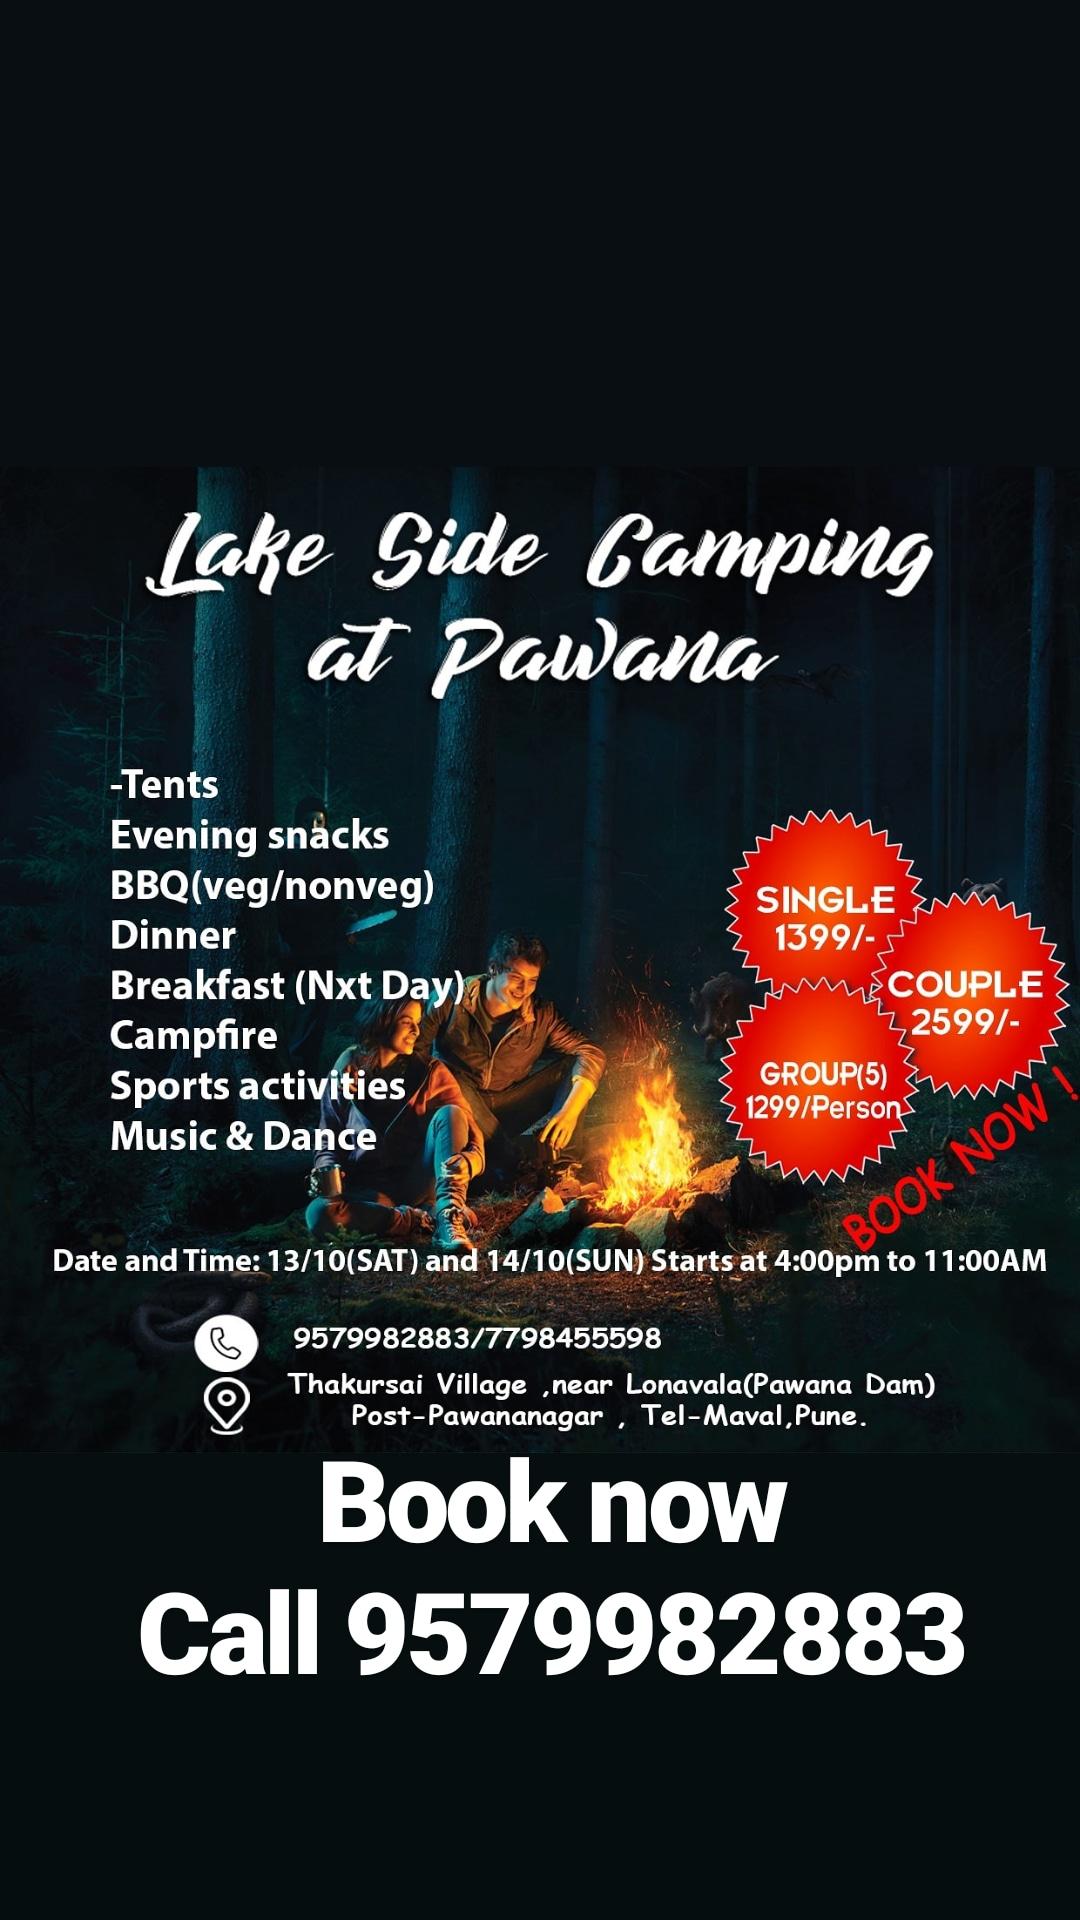 Pawana lakeside camping is the best weekend gateway